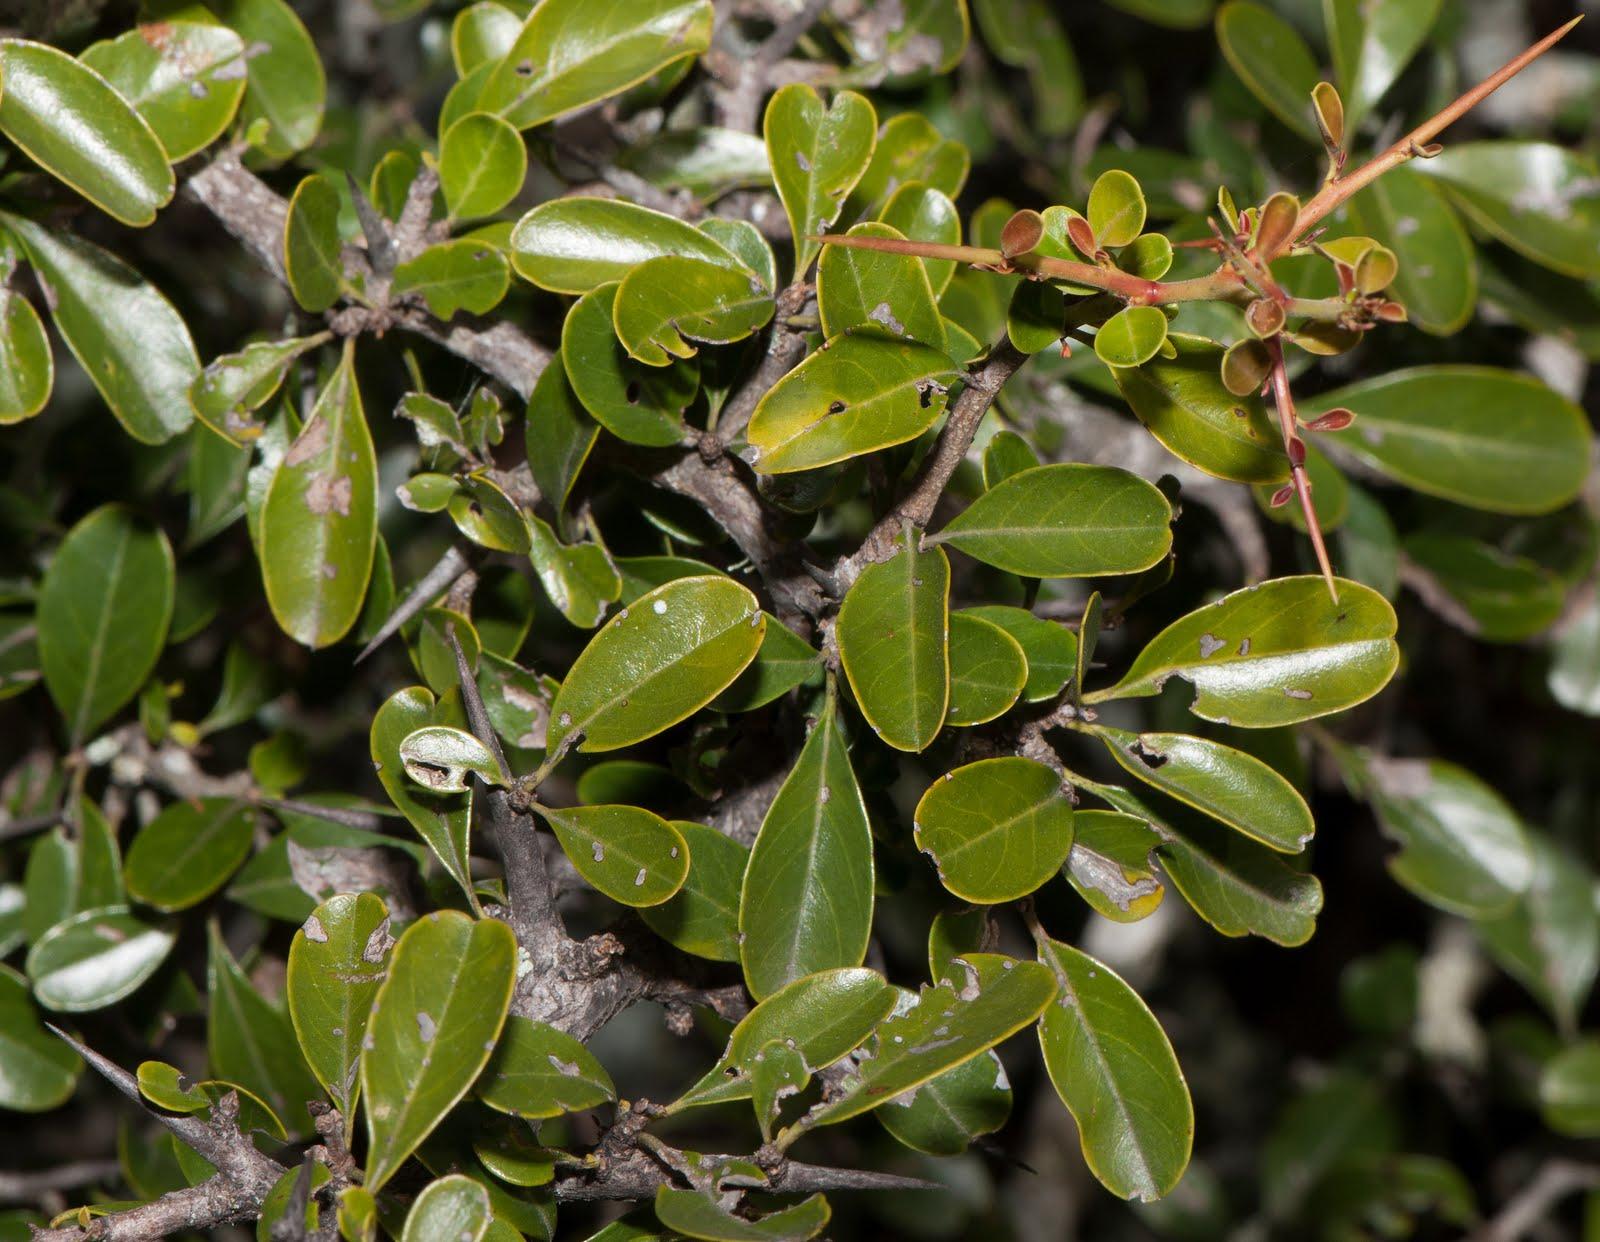 Paisajista laila huber rboles nativos condalia - Color verde hoja ...